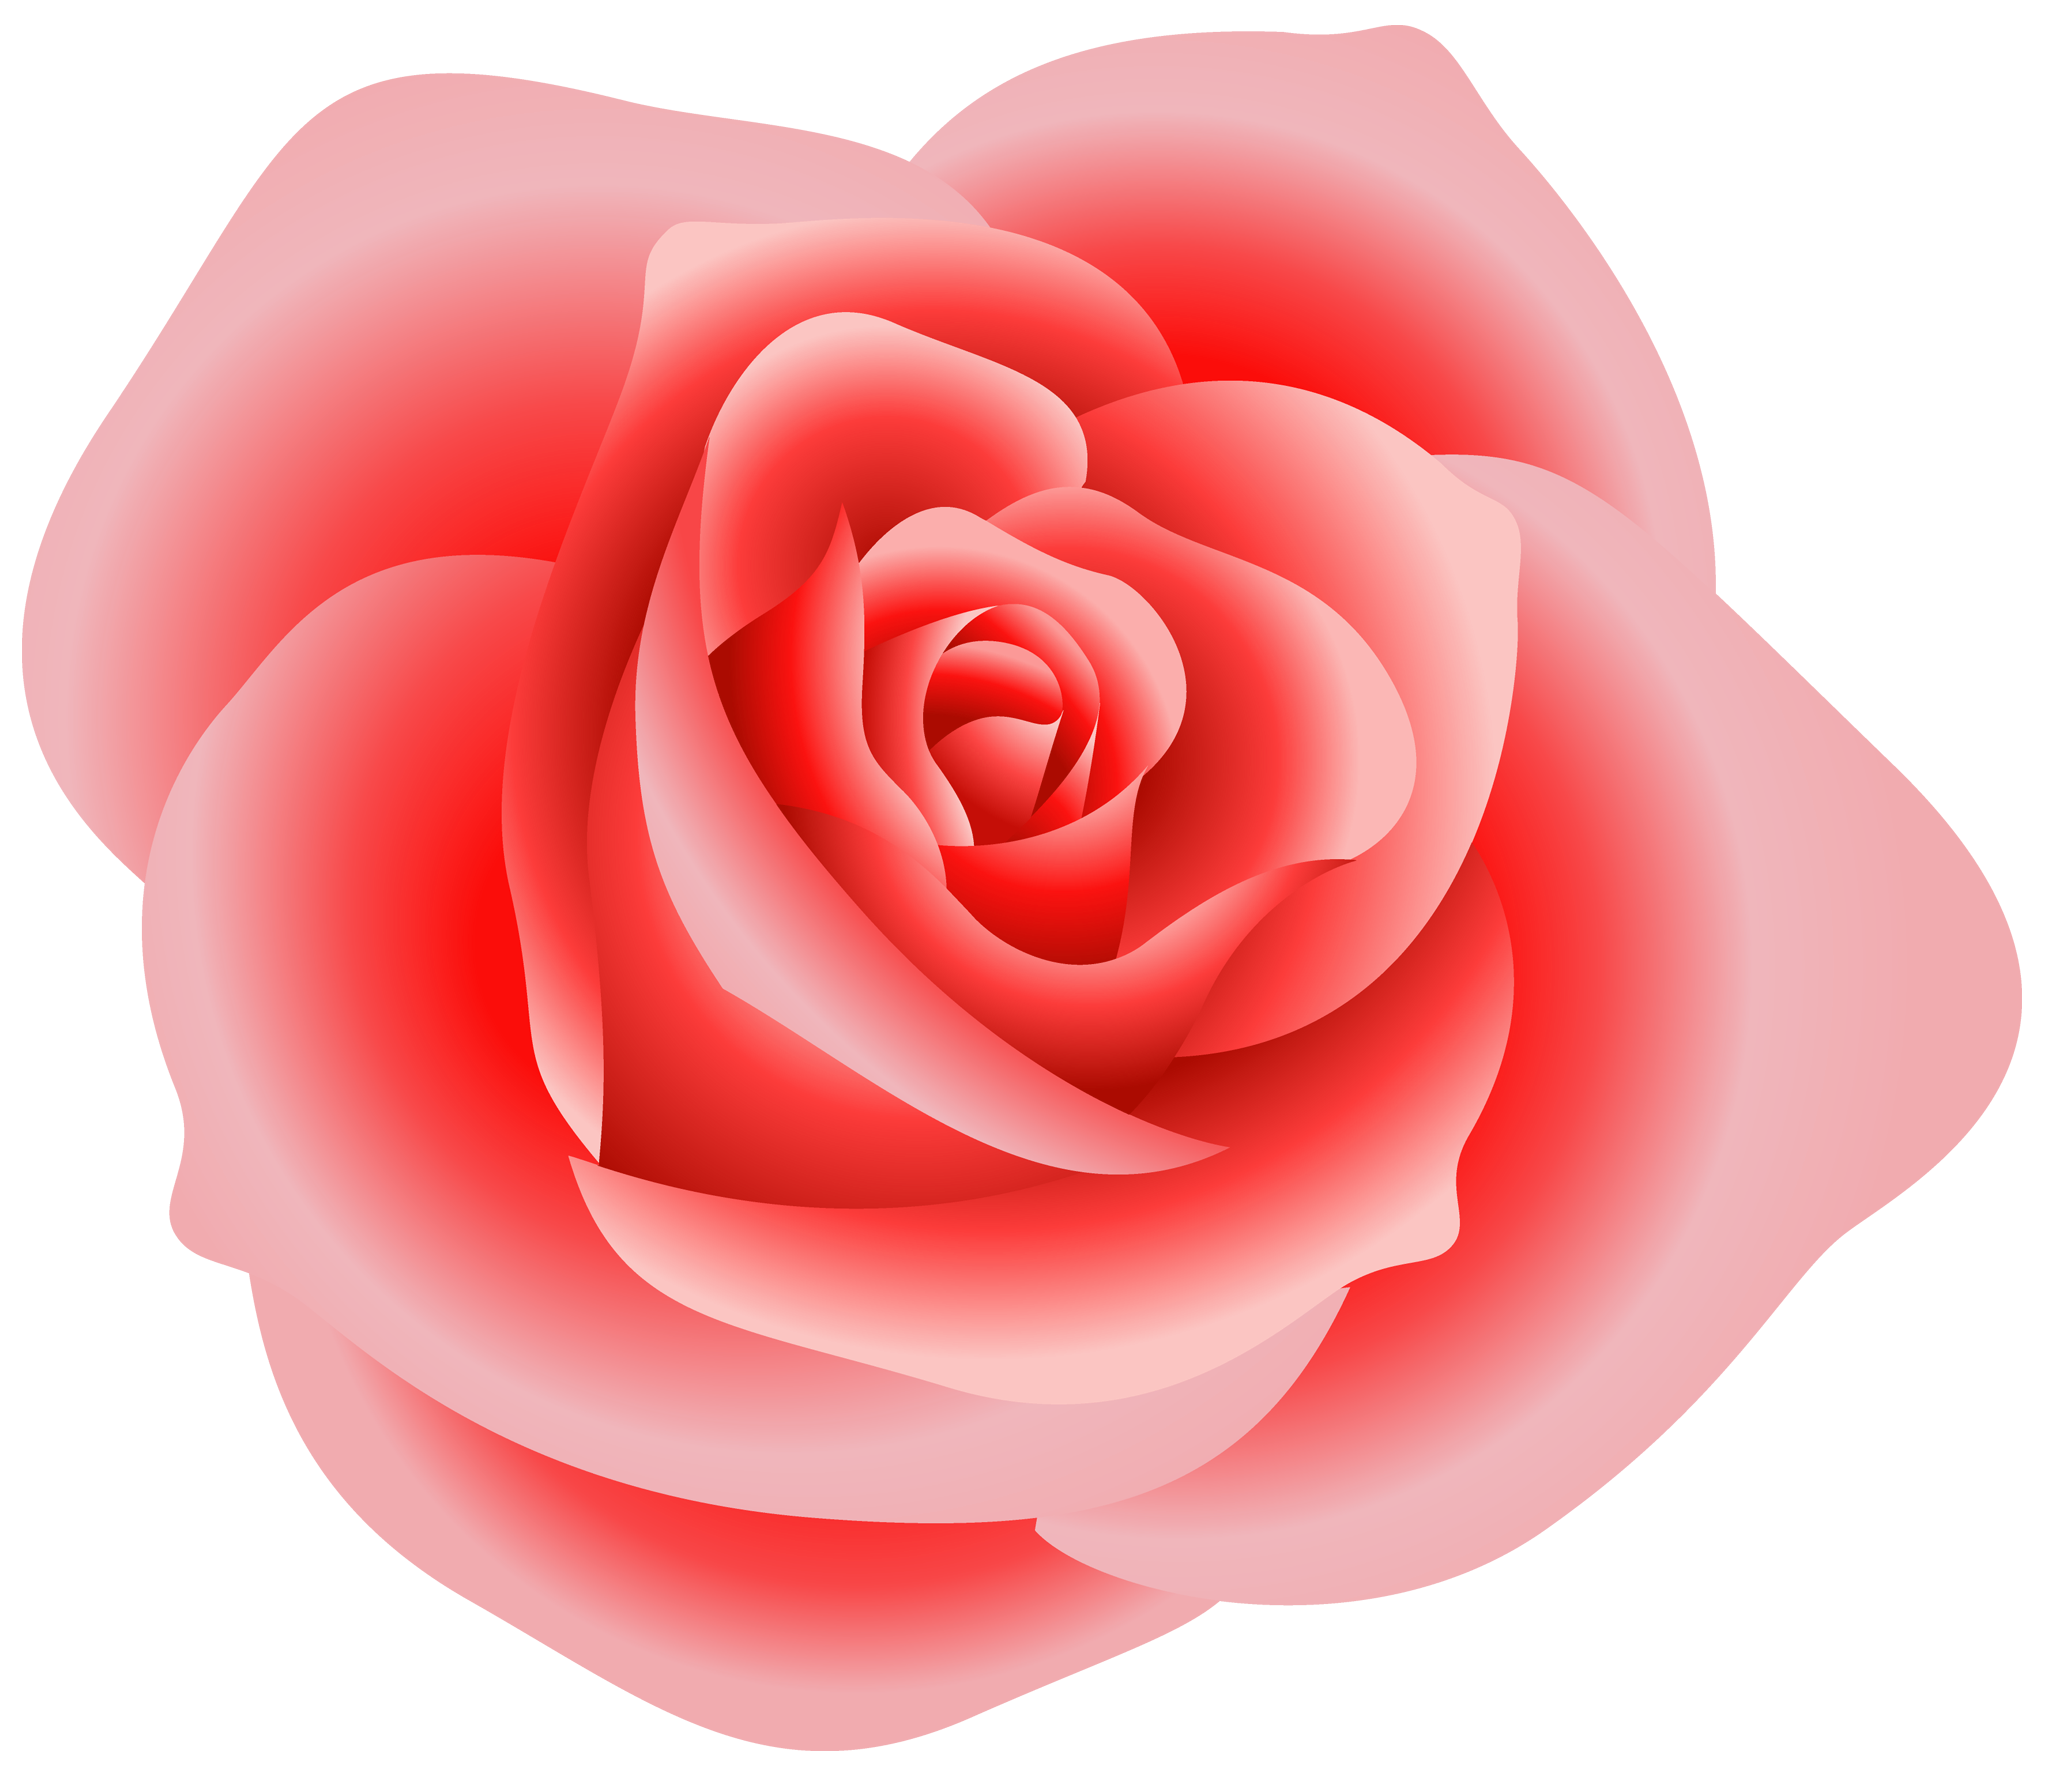 Roses Rose Clip Art Vector Images-Roses rose clip art vector images-17